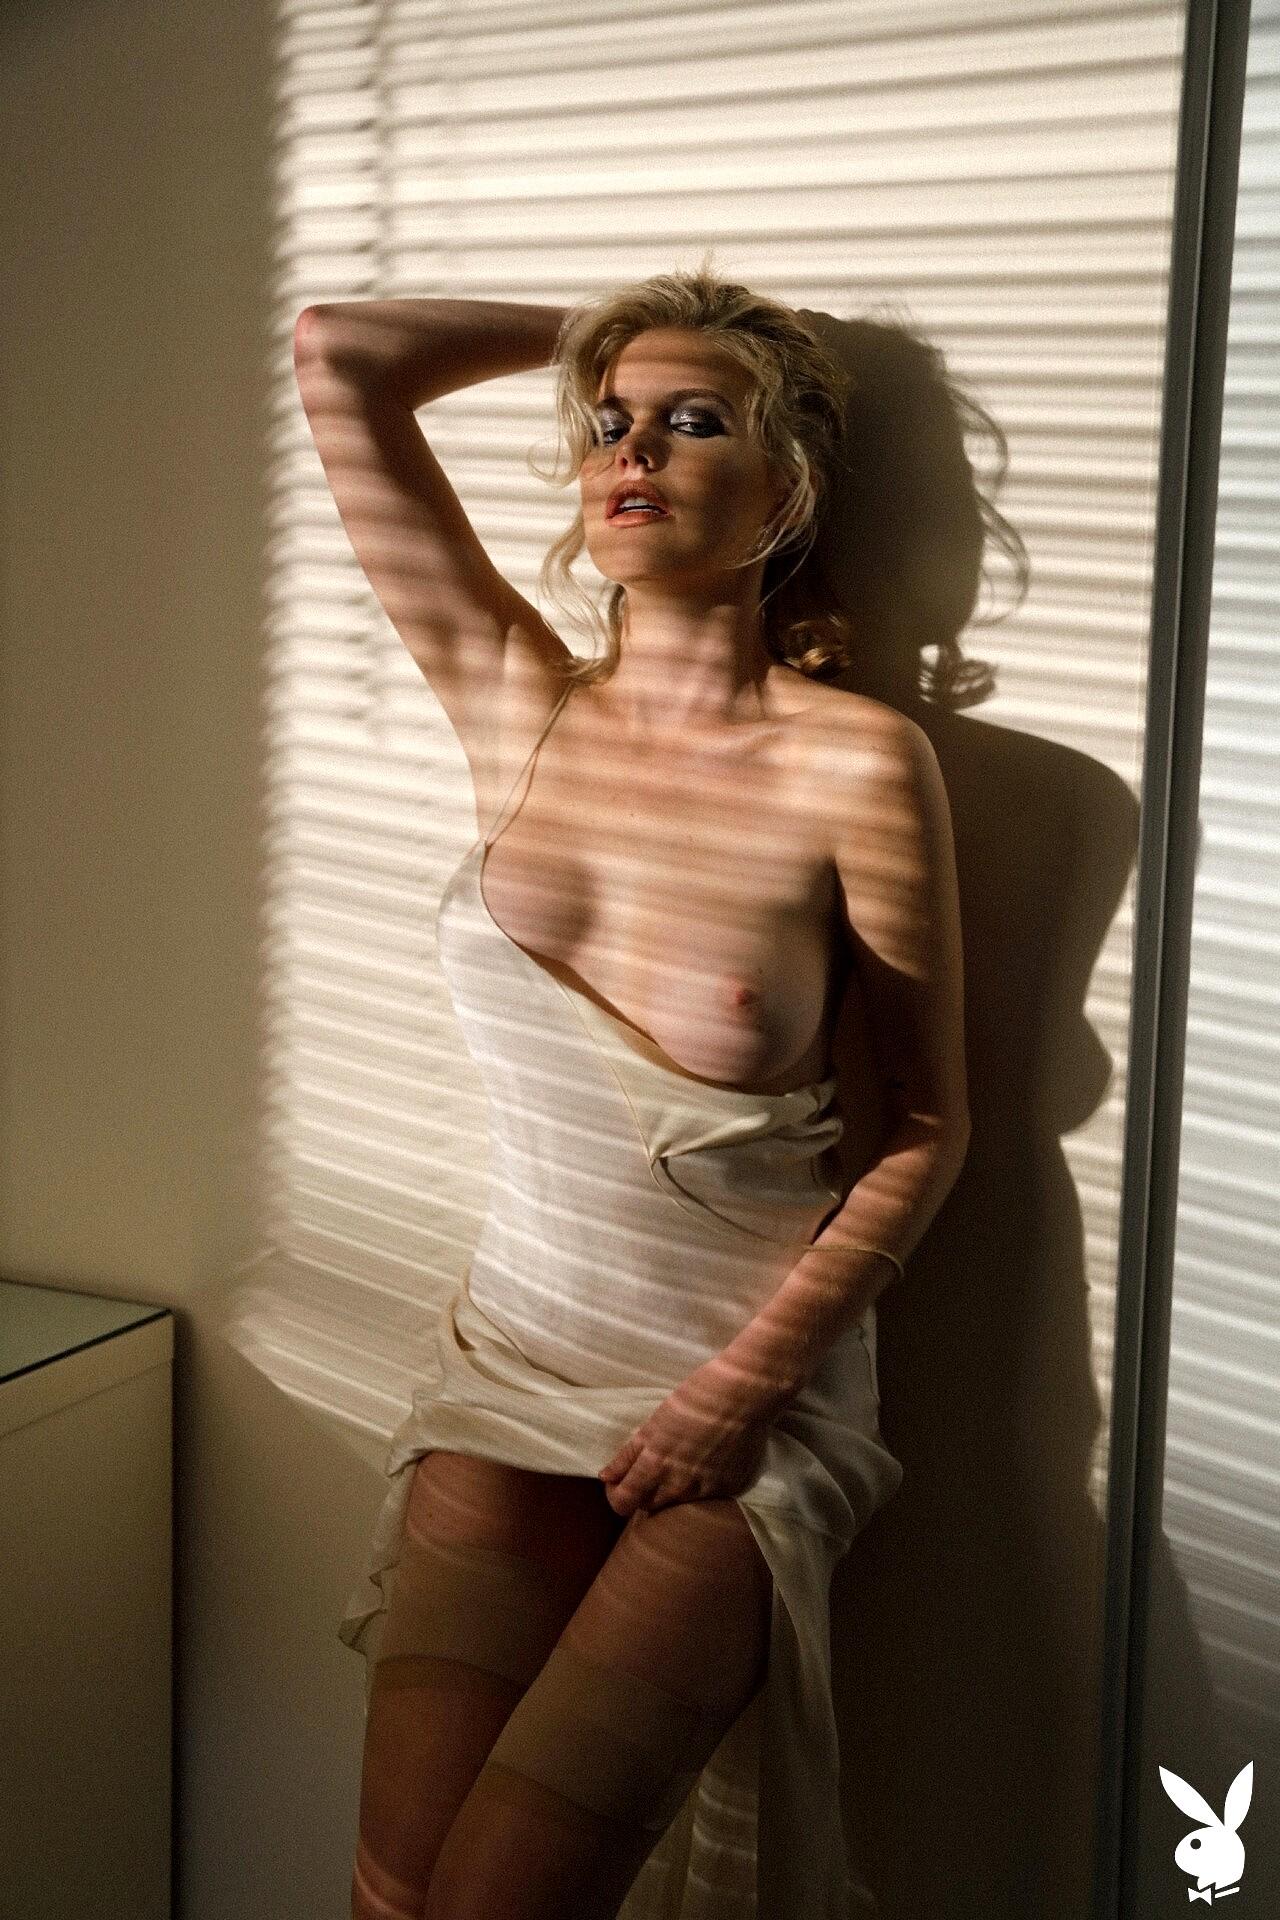 Kayslee collins nude